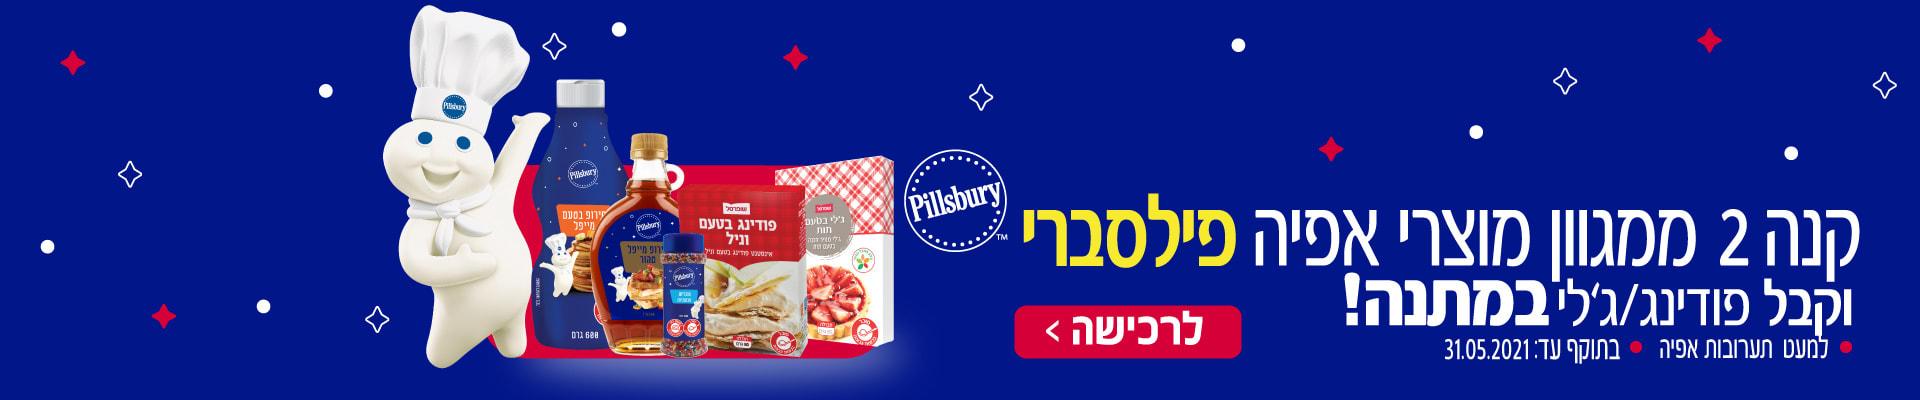 PILLSBURY קנה ממגוון מוצר אפיה פילסברי וקבל פודינג/ג'לי במתנה! למעט תערובות אפיה לרכישה בתוקף עד 31.05.2021